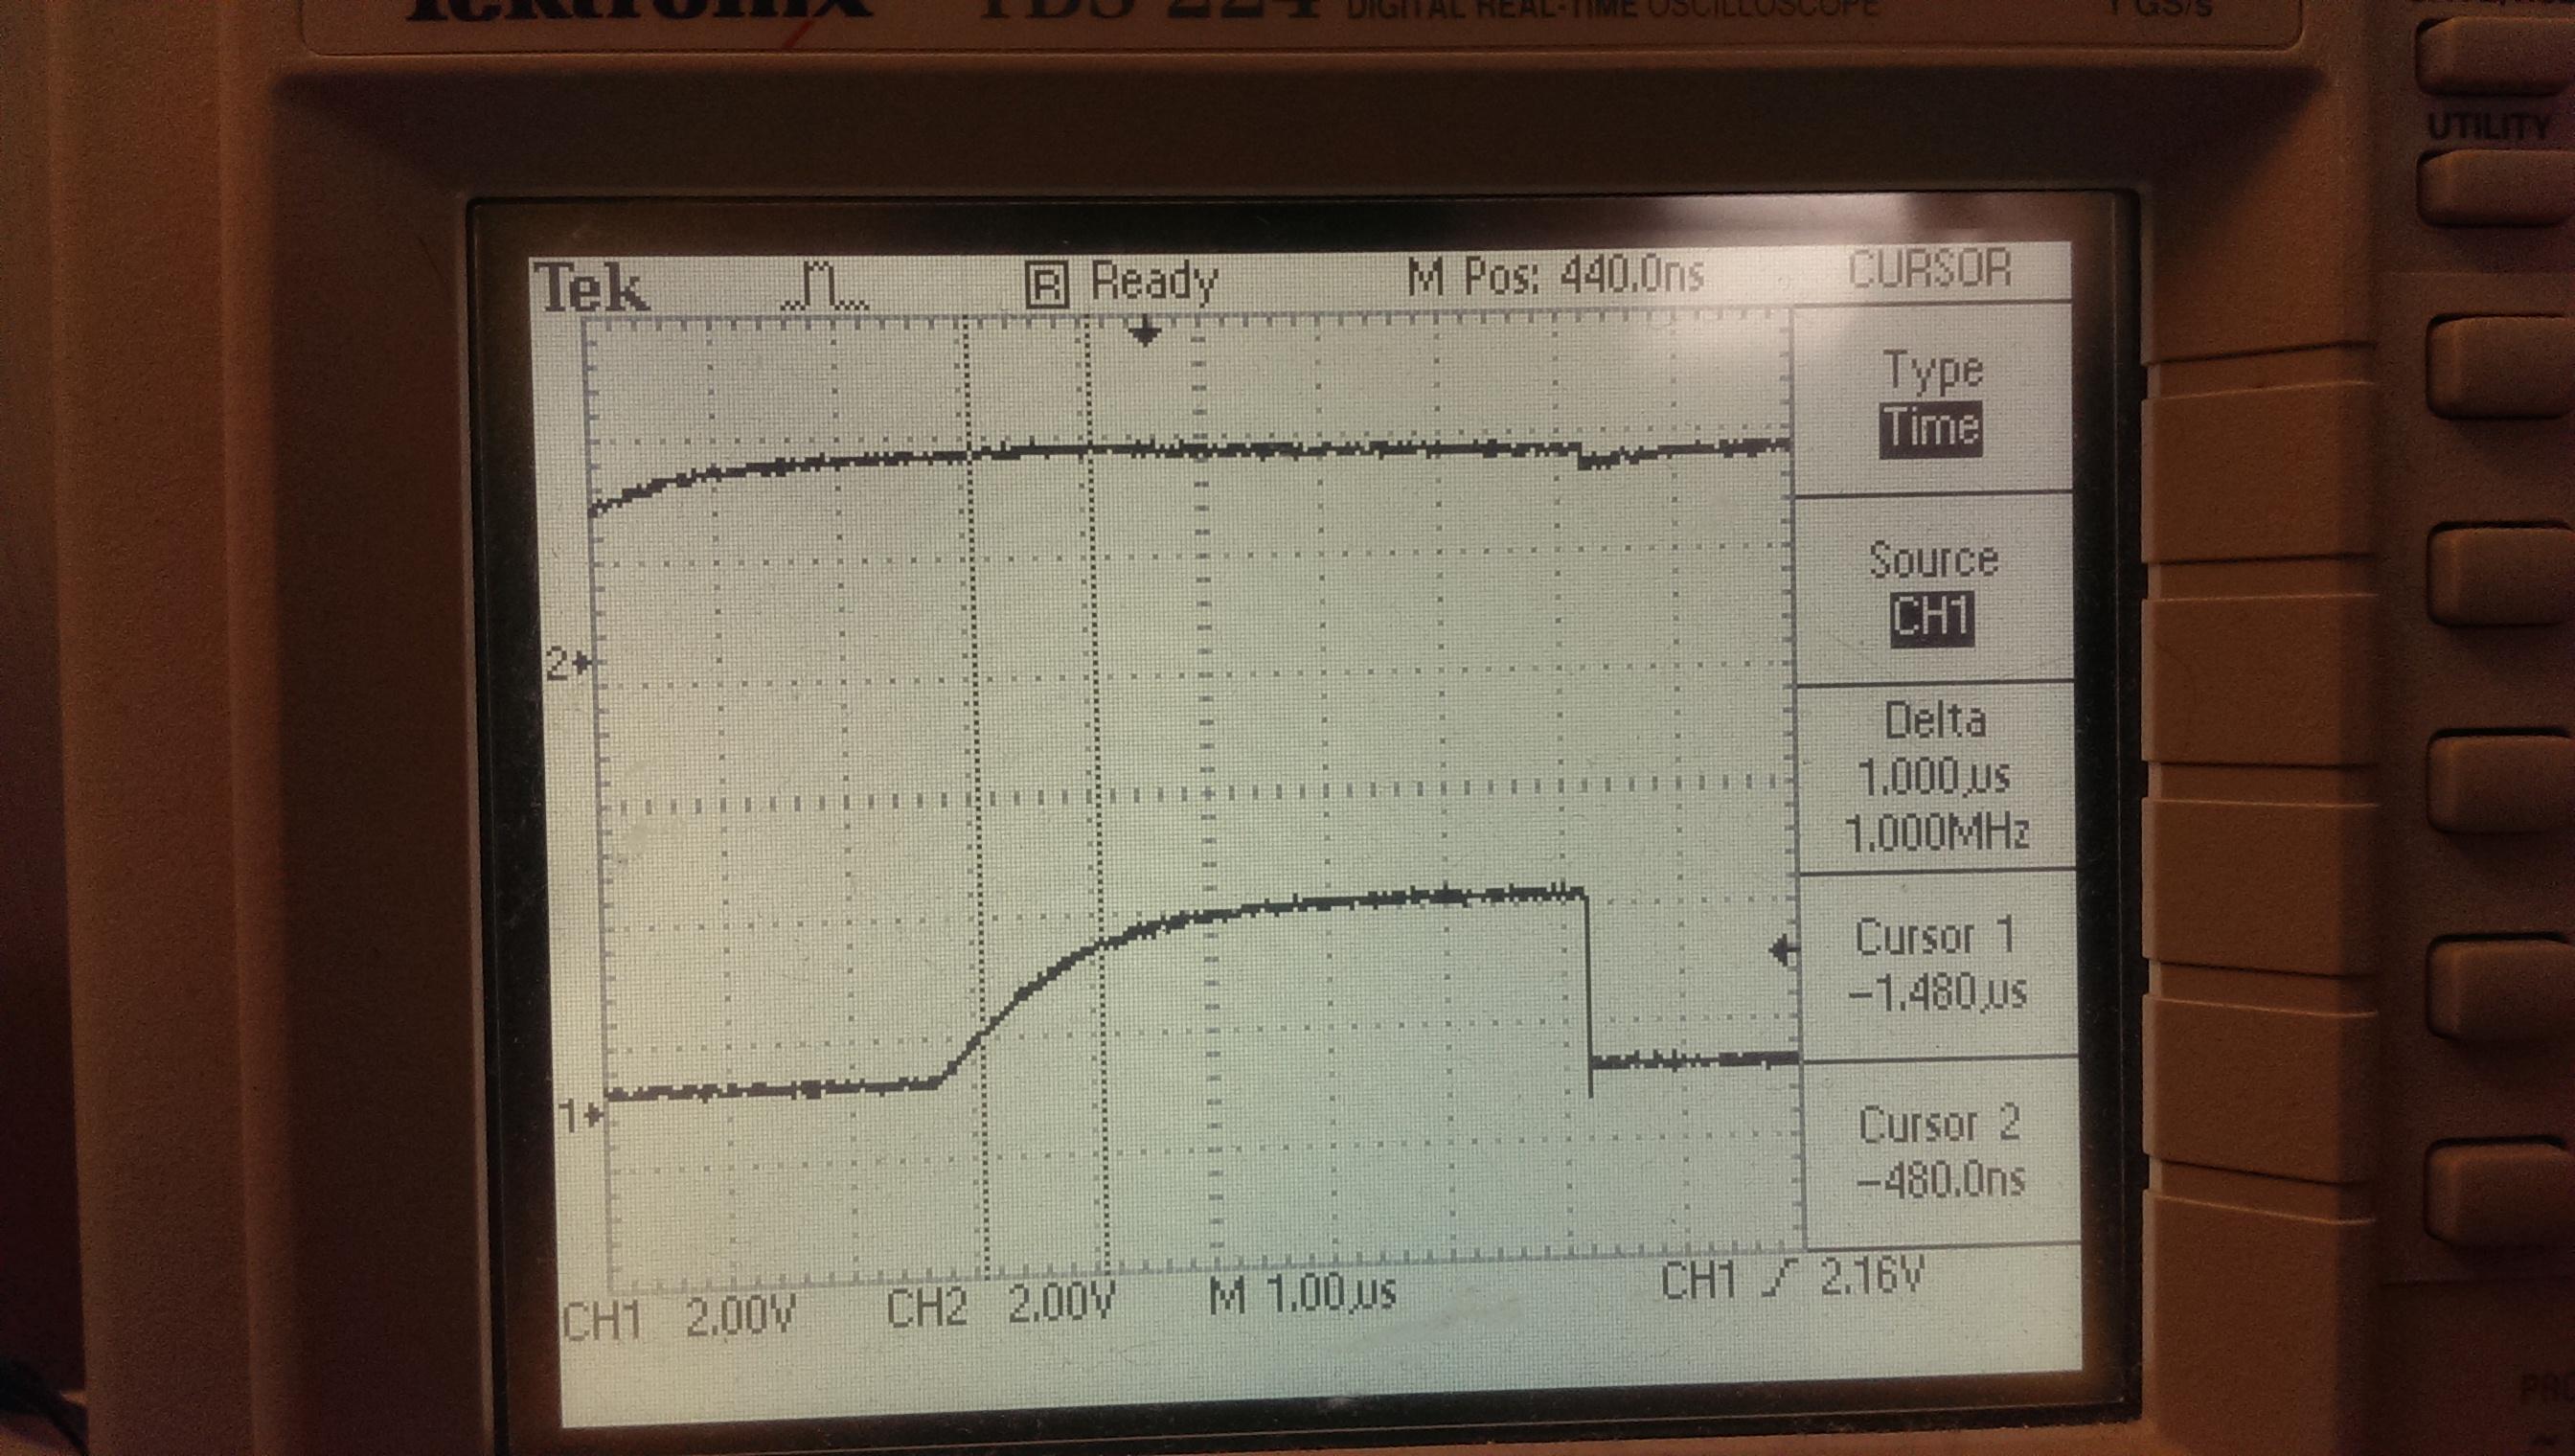 Apparent i2c byte framing error on Beaglebone Black  - Processors